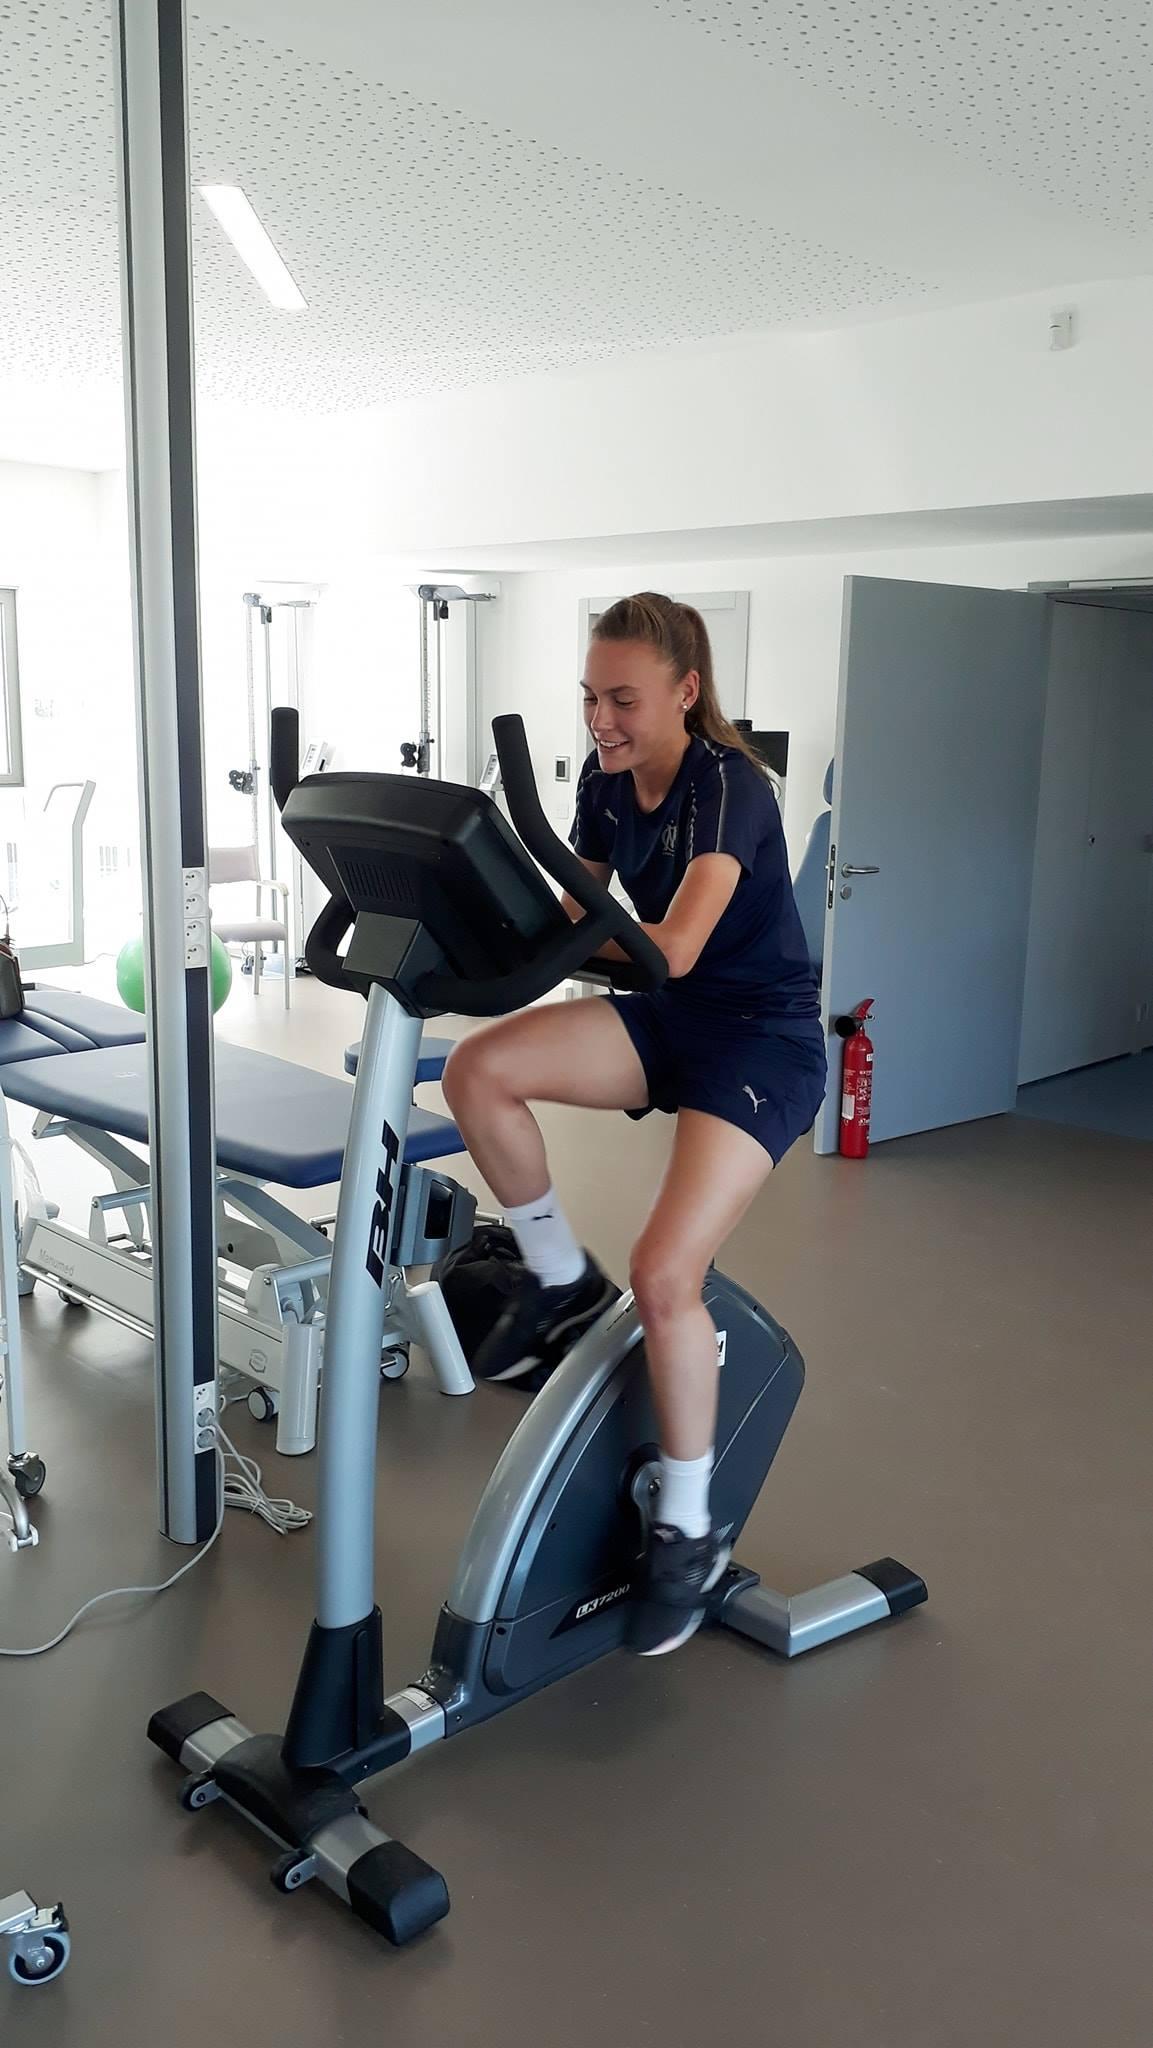 Joueuse de l'équipe de football féminine de l'Olympique de Marseille